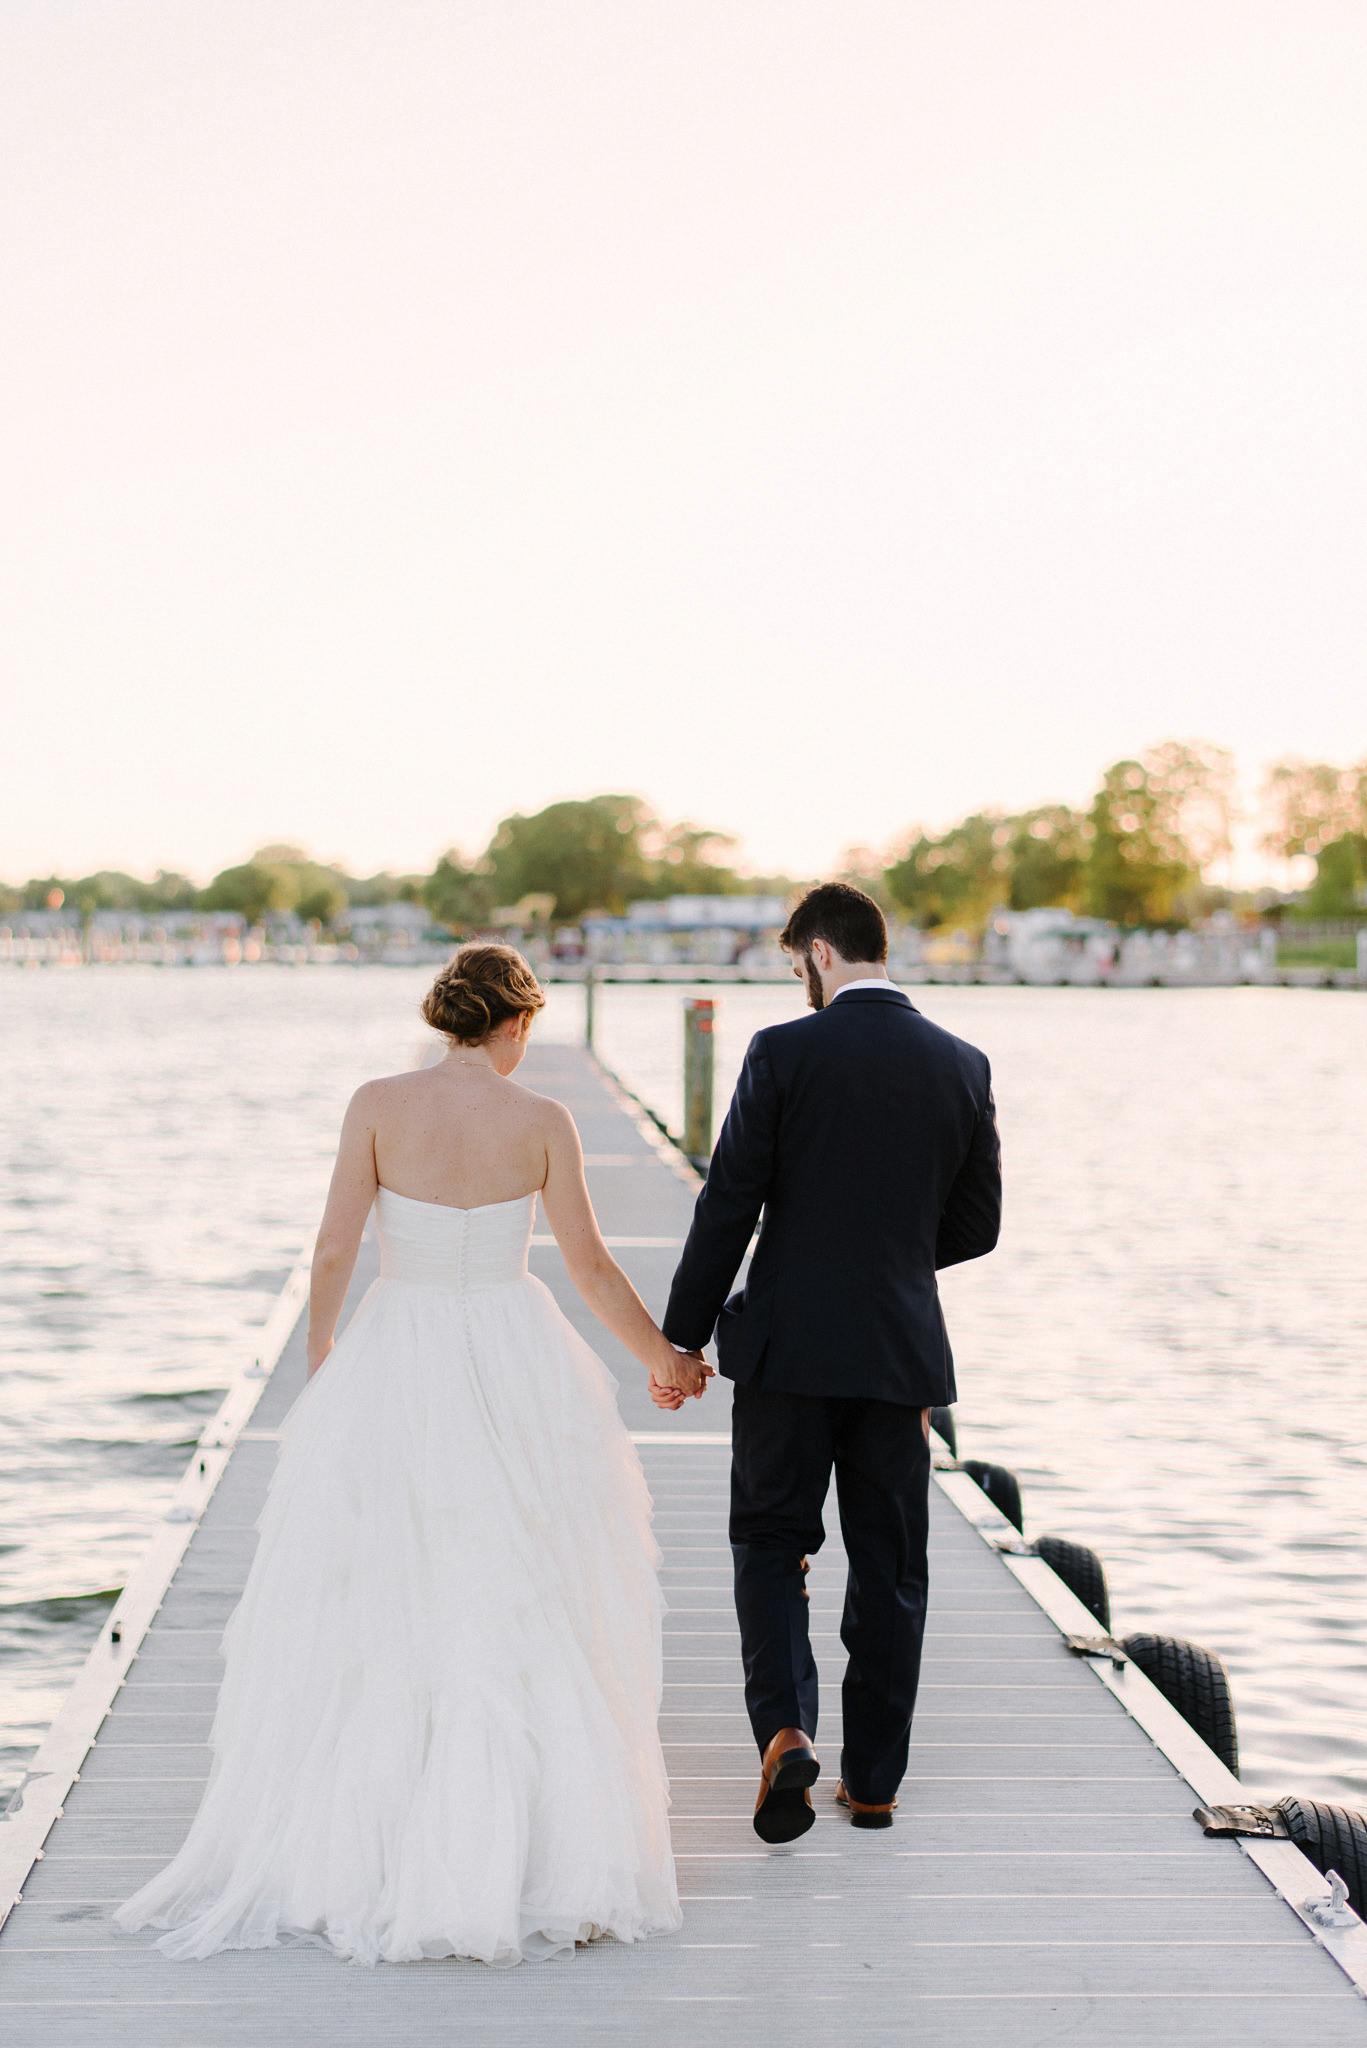 Tavares+Pavilion+on+the+Lake+Wedding+Florida_034.jpg